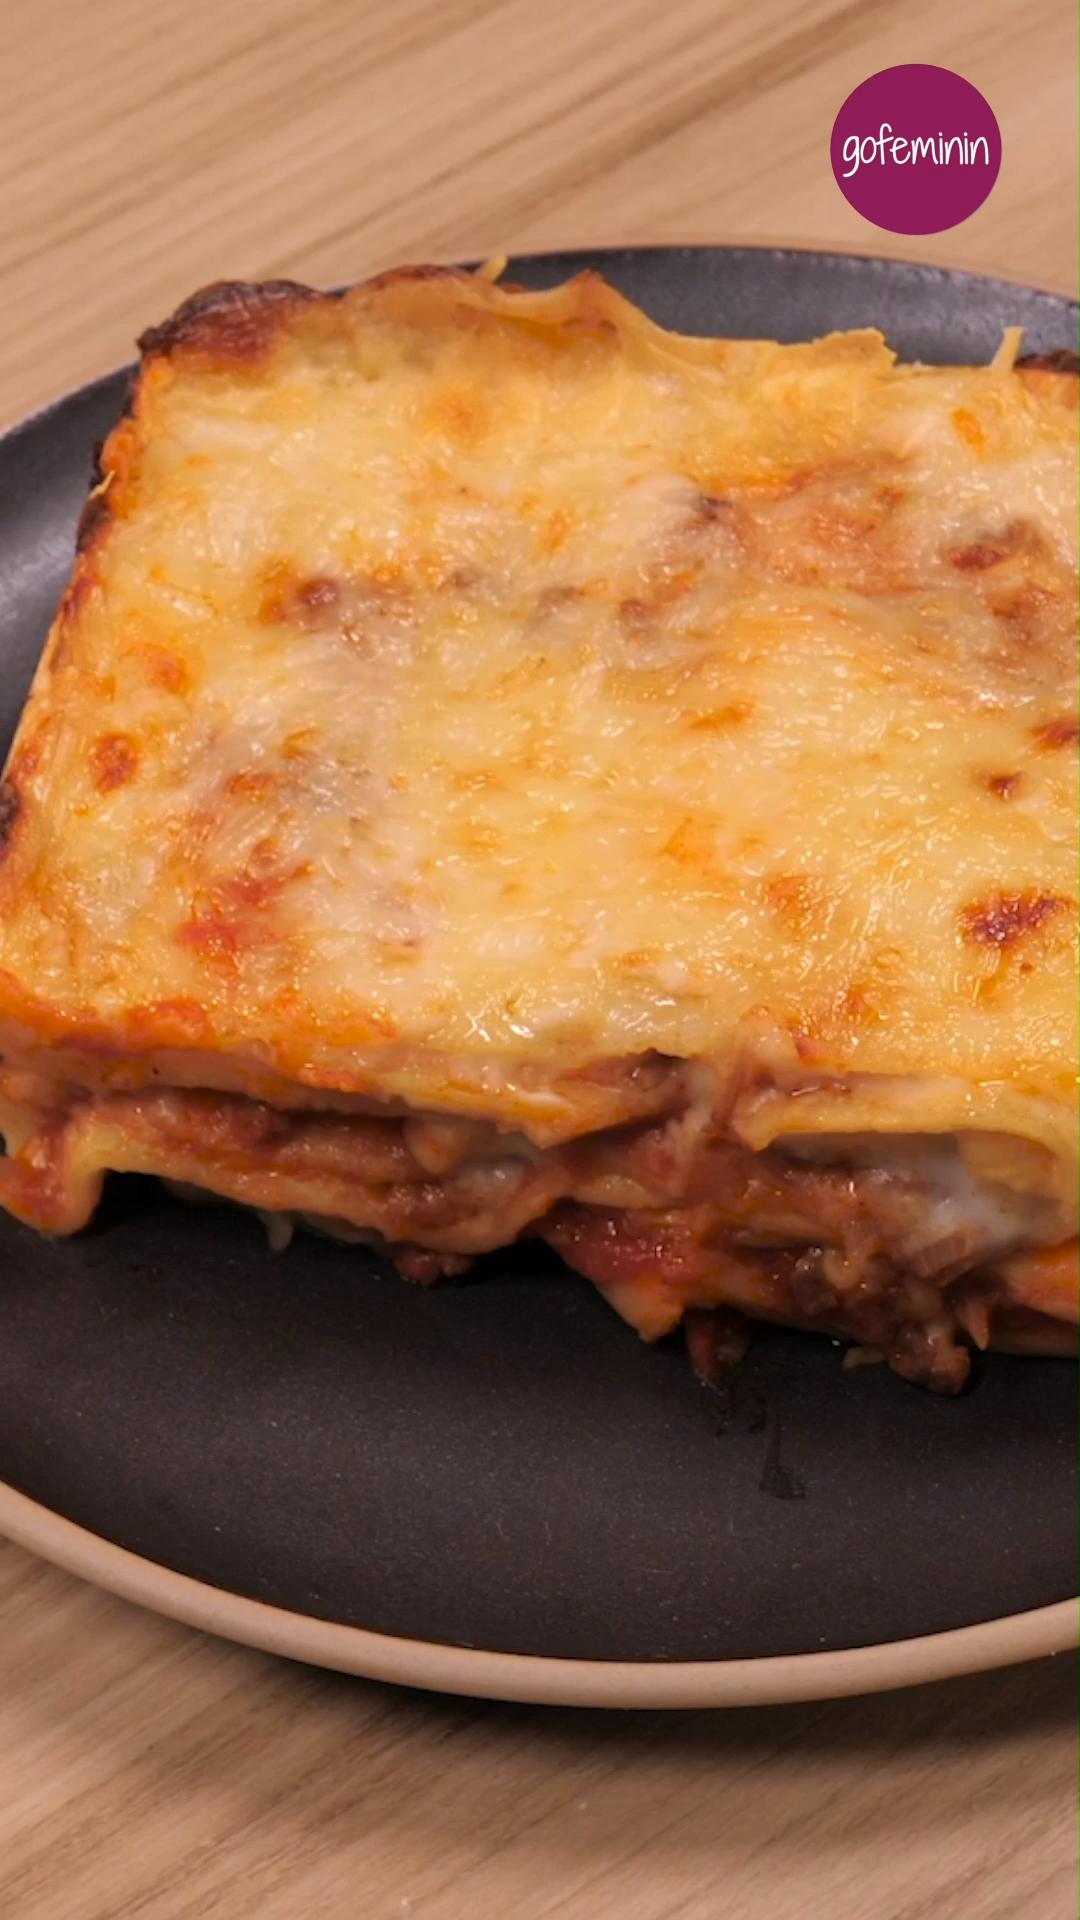 Photo of Das beste Lasagne-Rezept zum Nachkochen